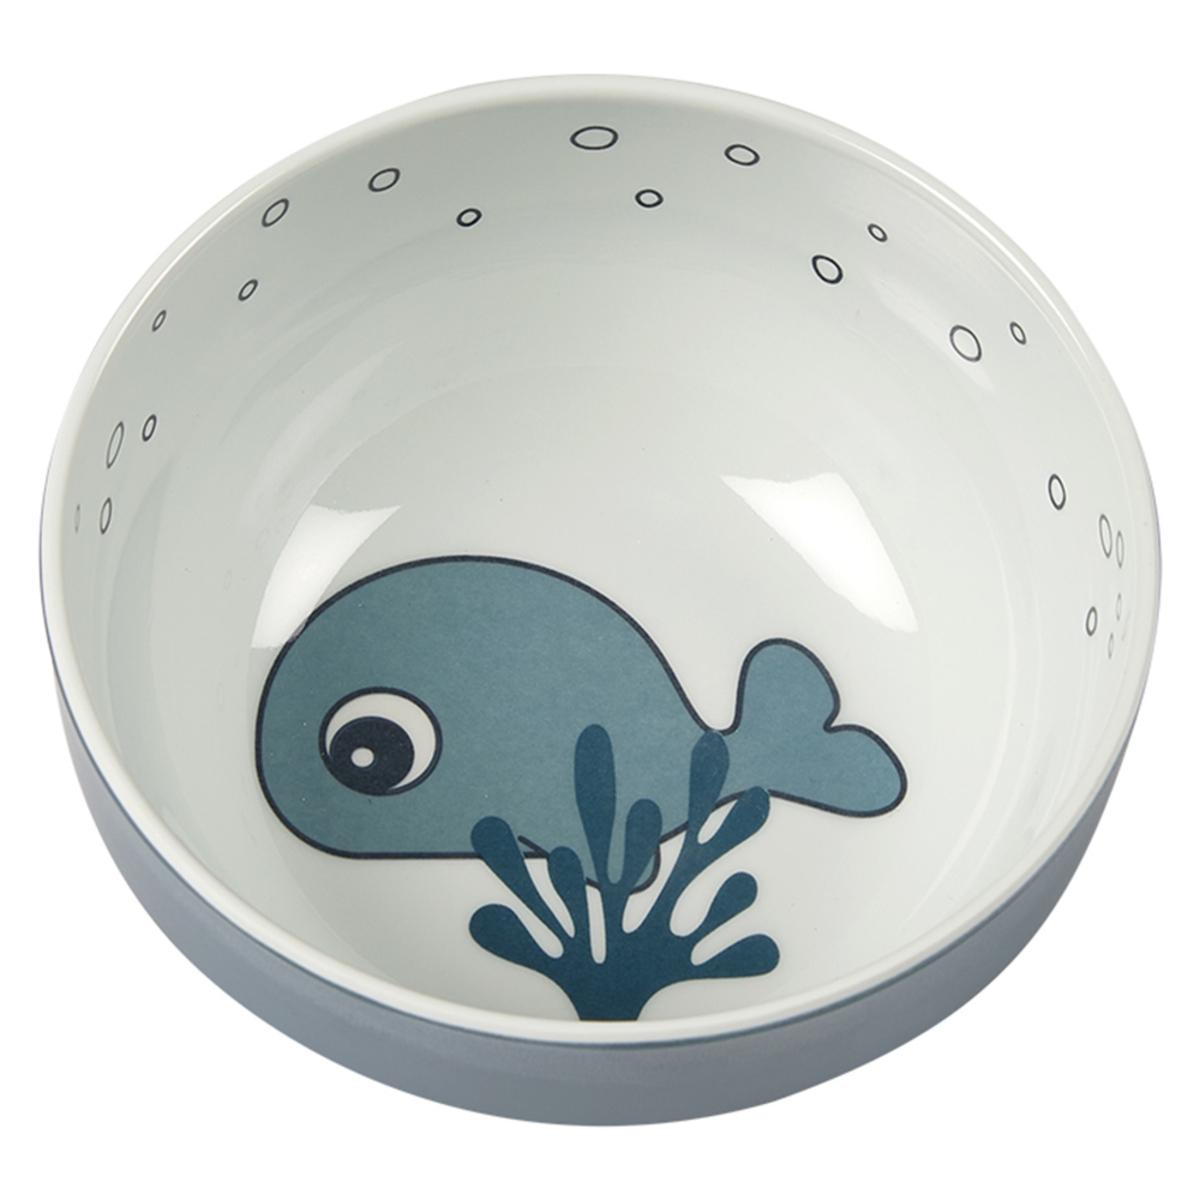 Vaisselle & Couvert Mini Bol - Sea Friends Bleu Mini Bol - Sea Friends Bleu